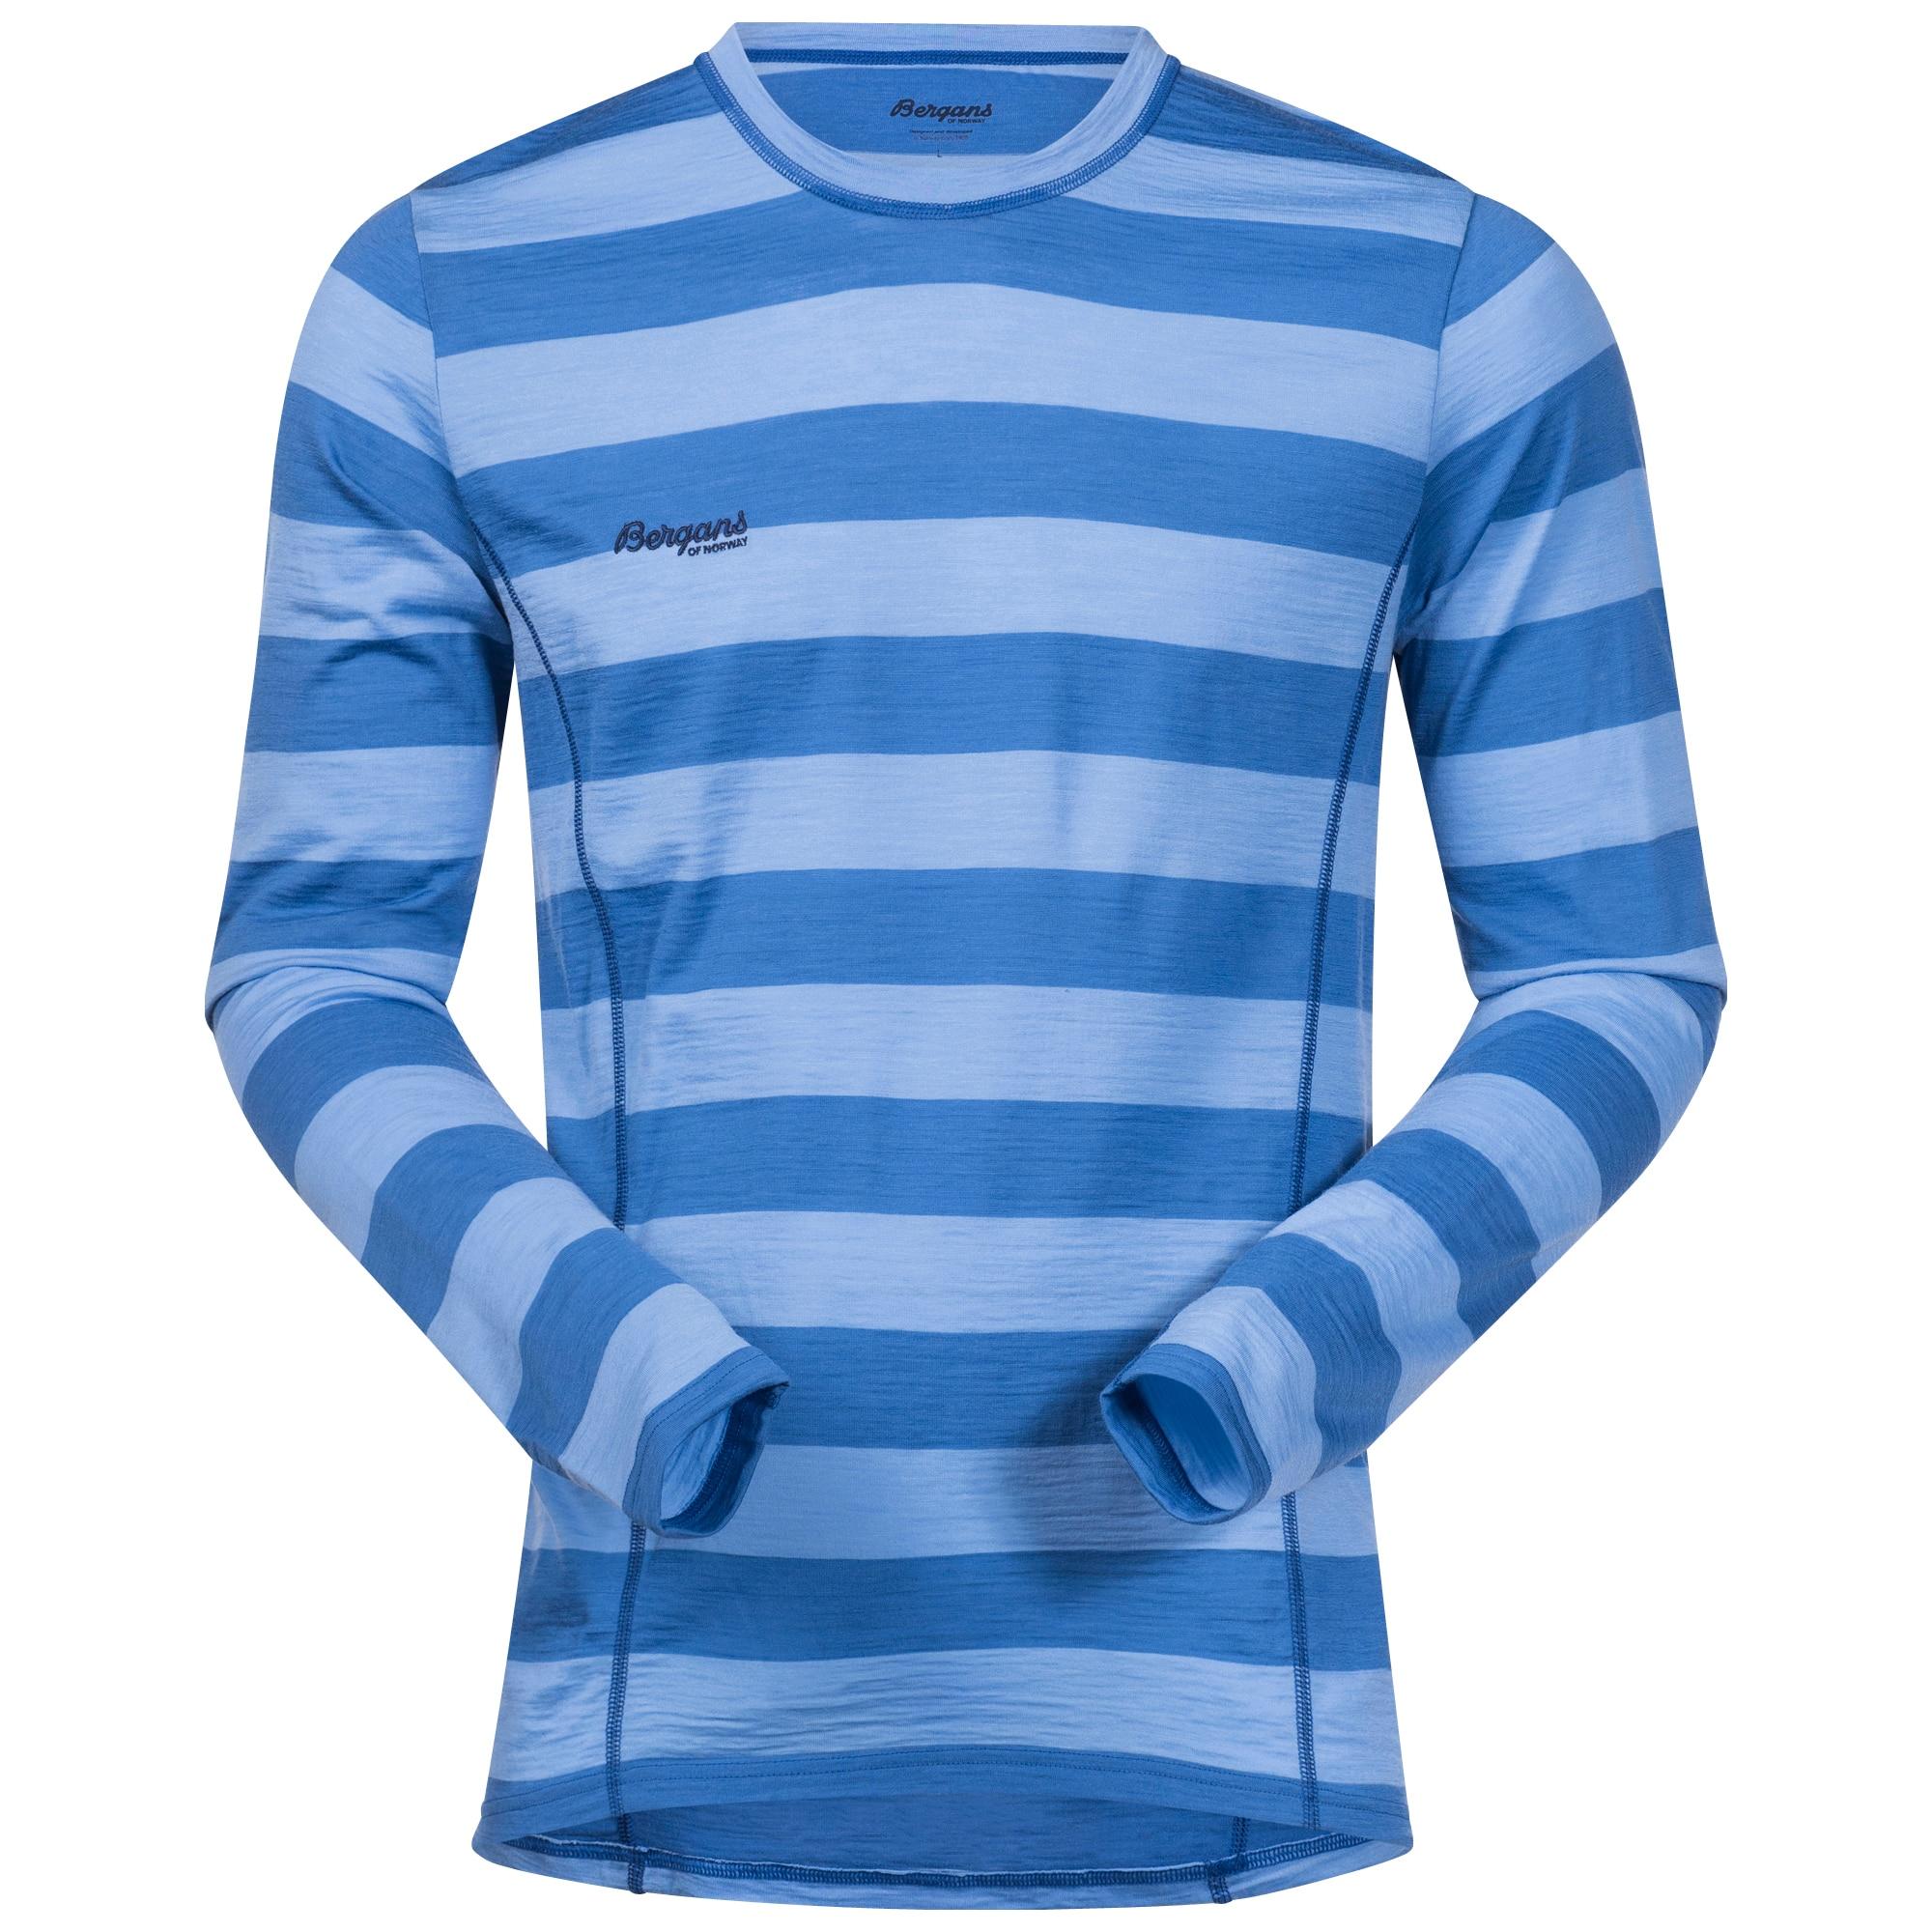 Soleie Shirt